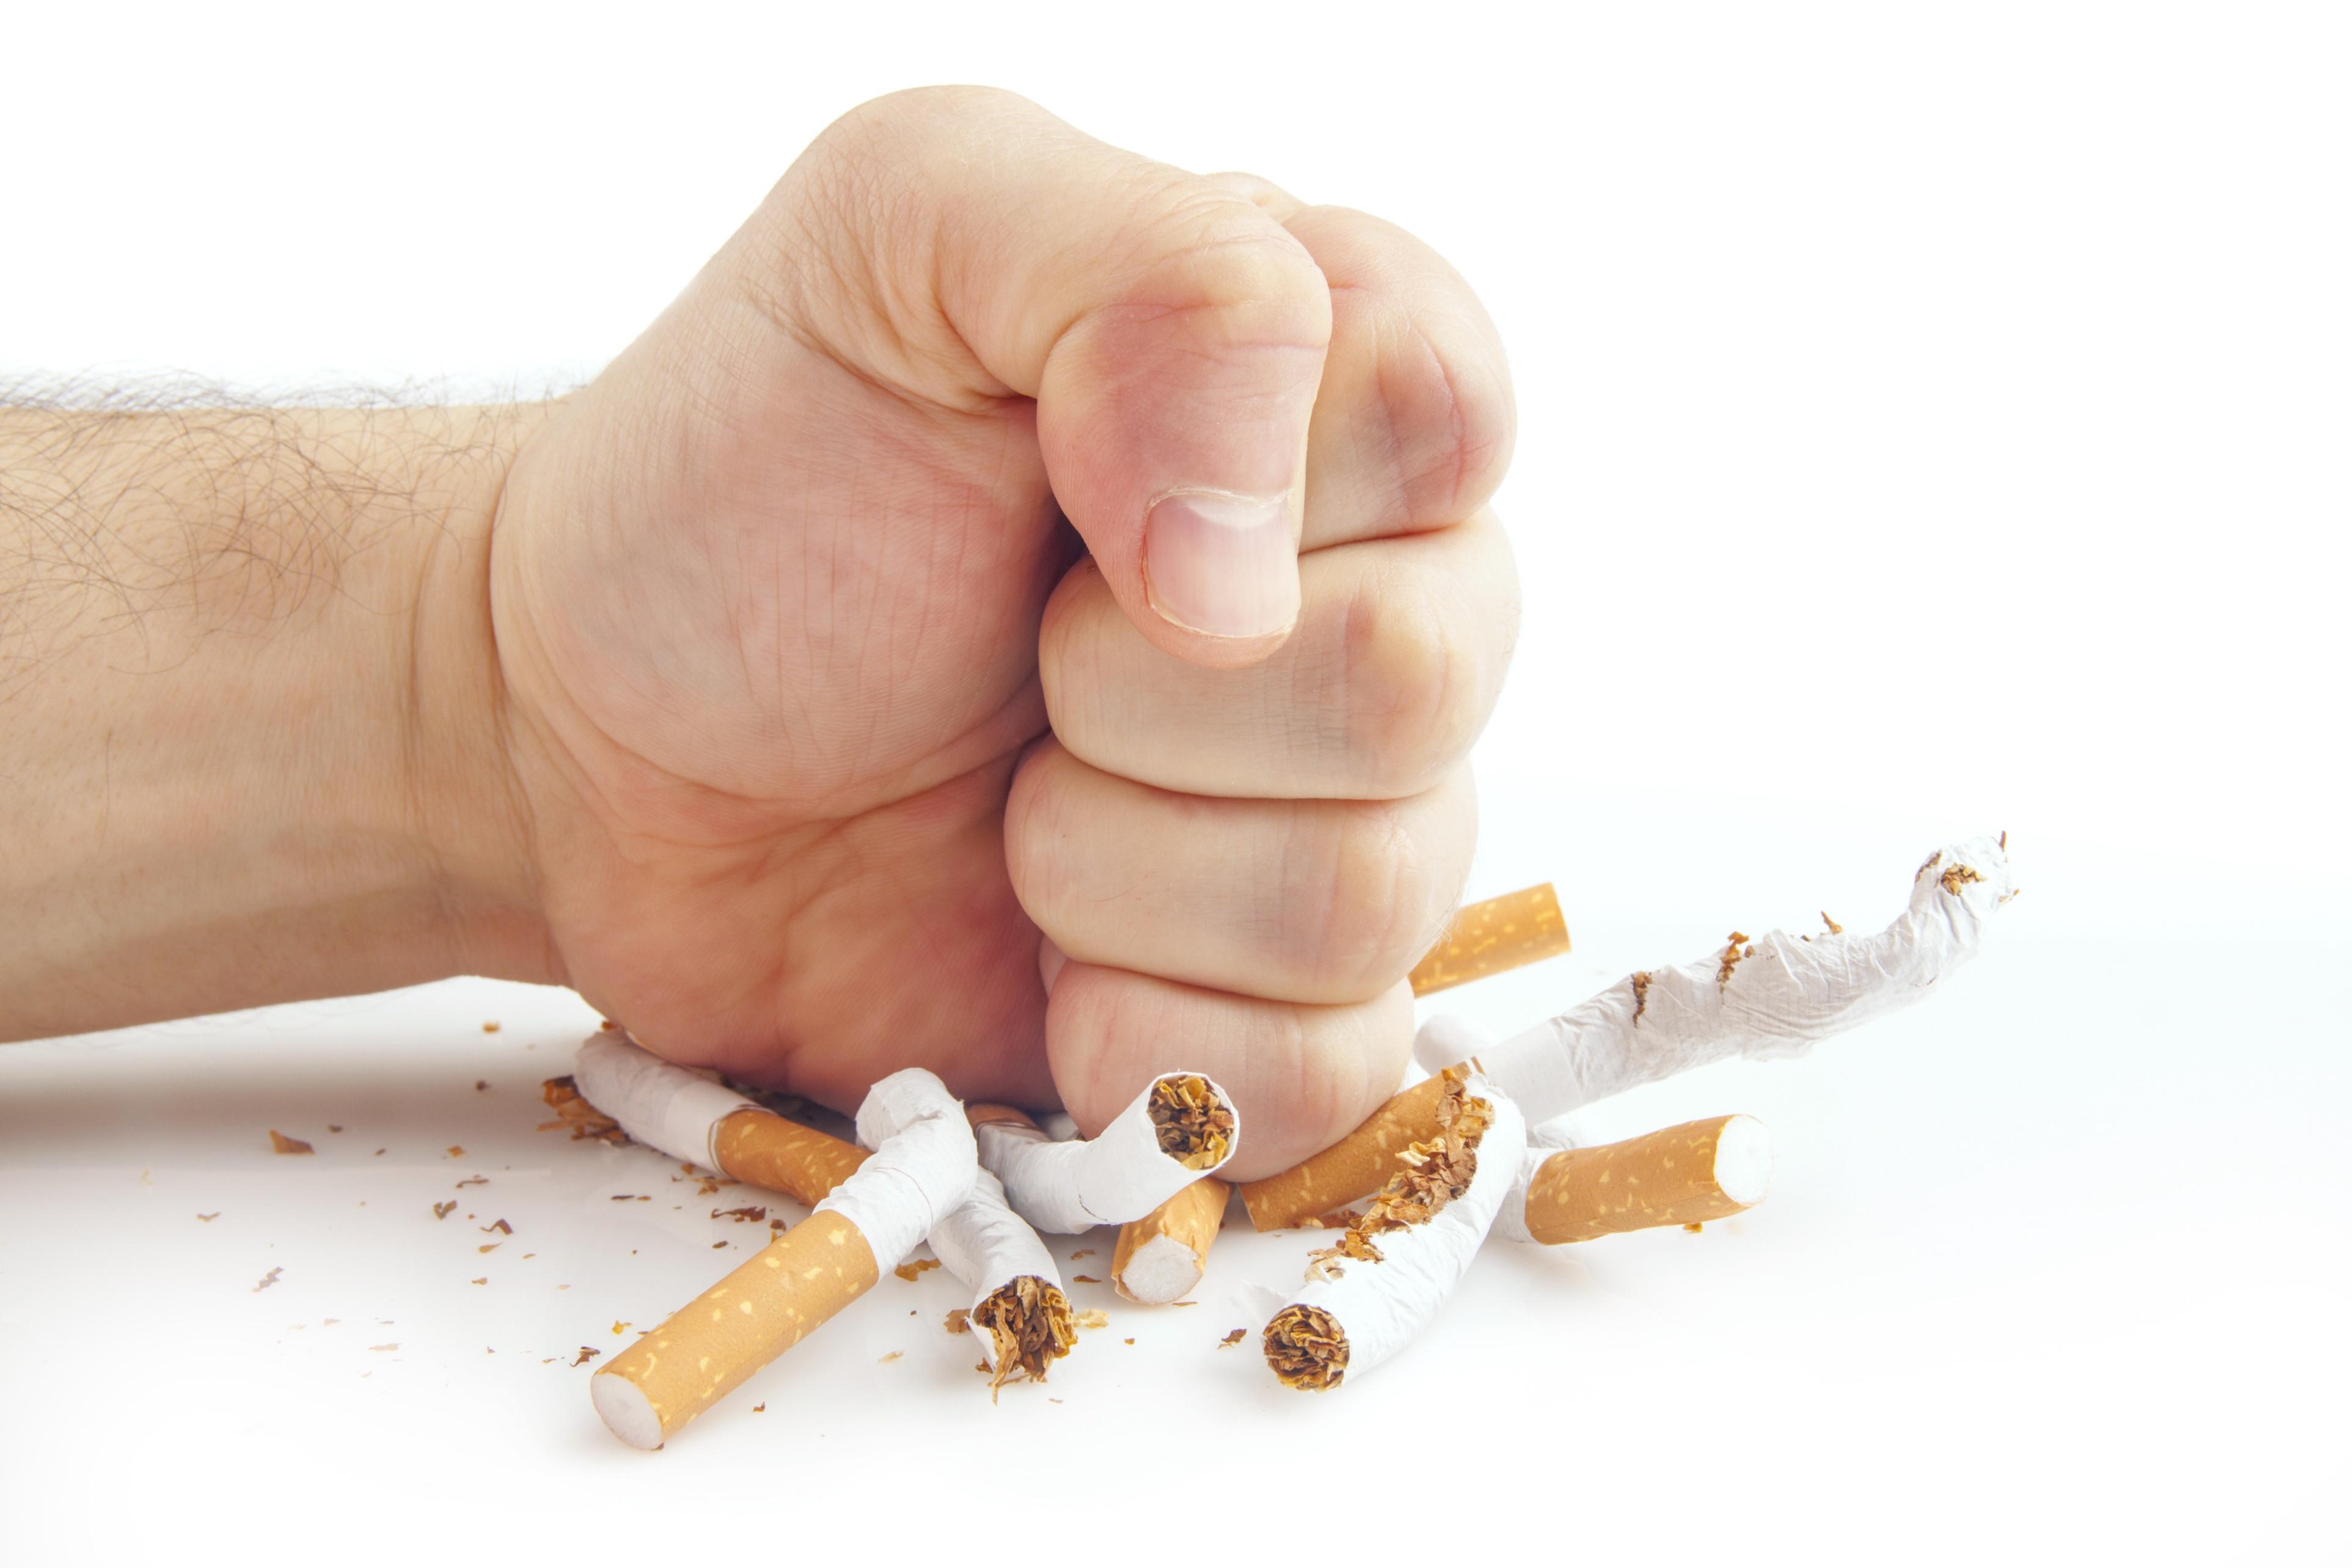 Smoking cessation